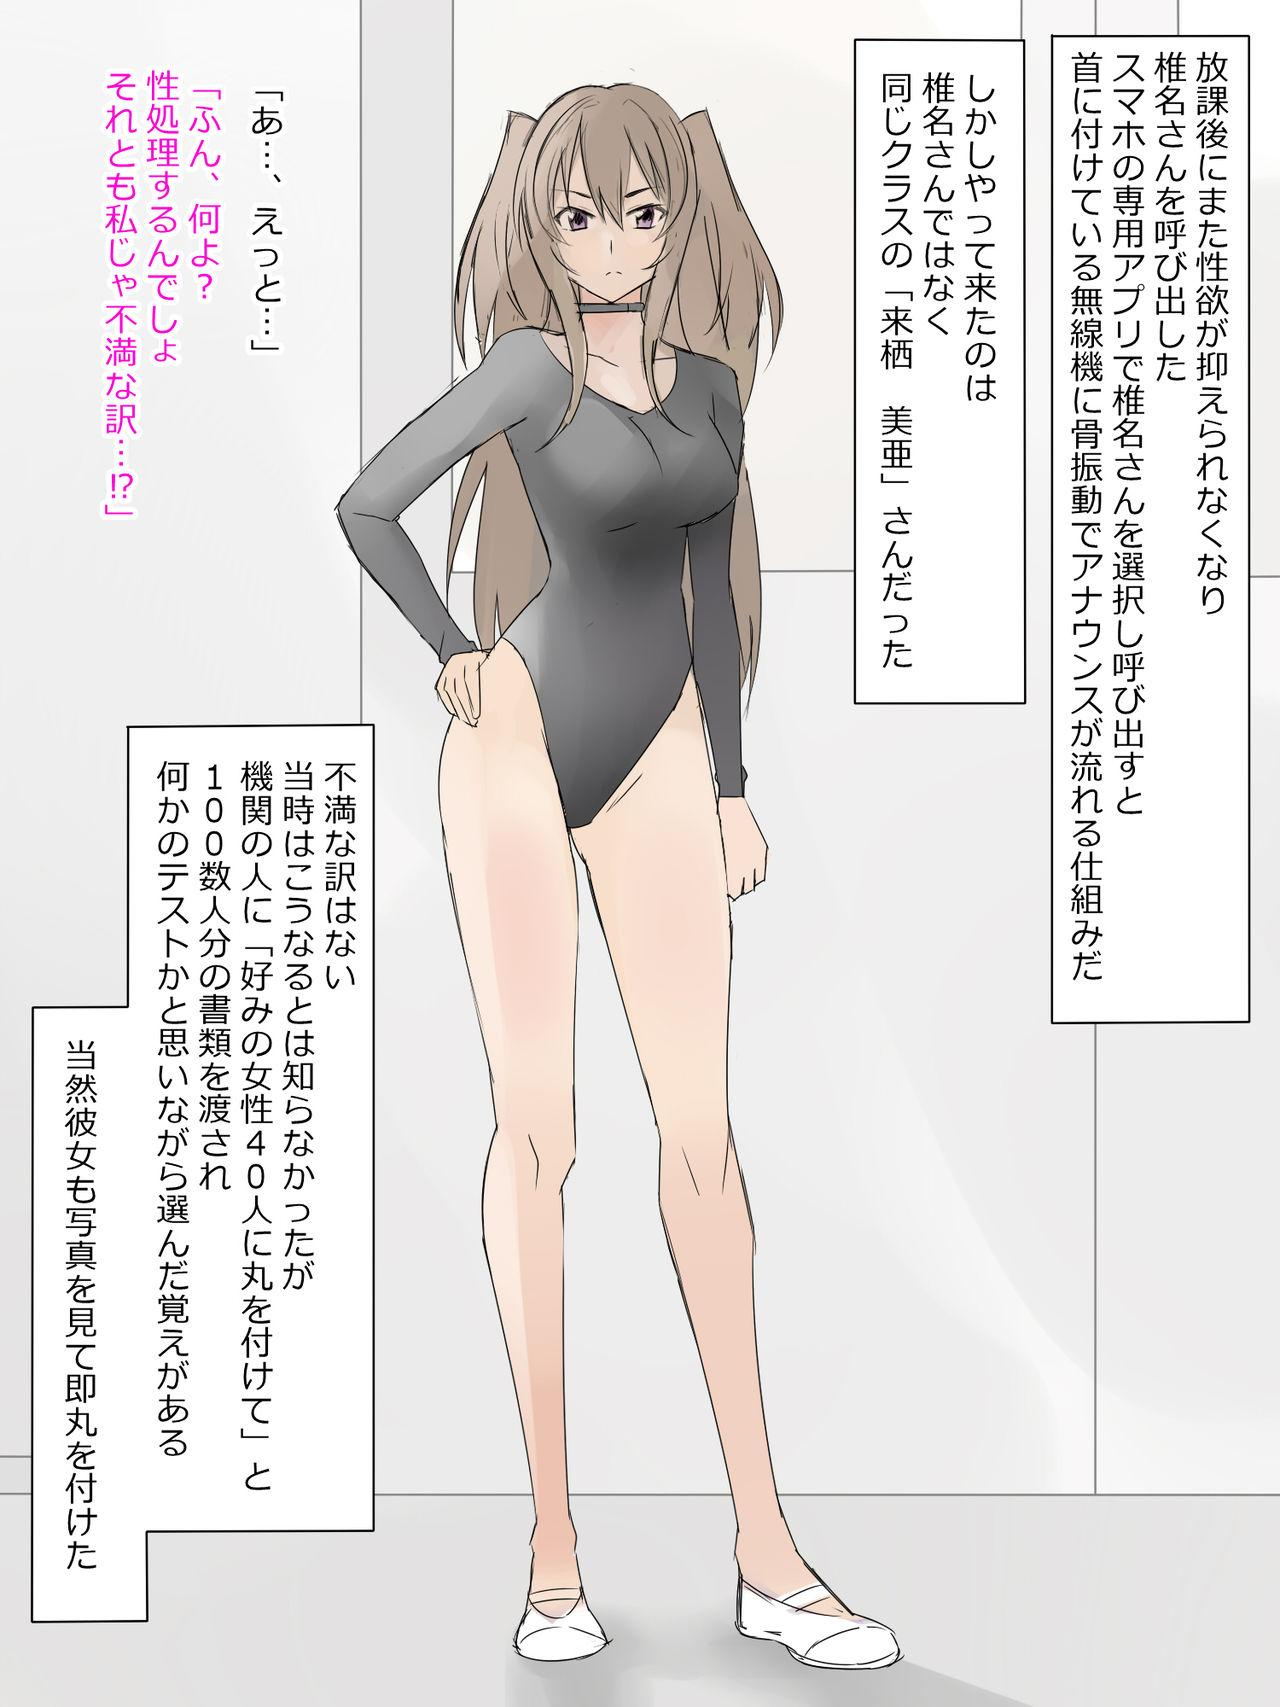 [Kagemusha] Arima-kun to 40-nin no Classmate 7